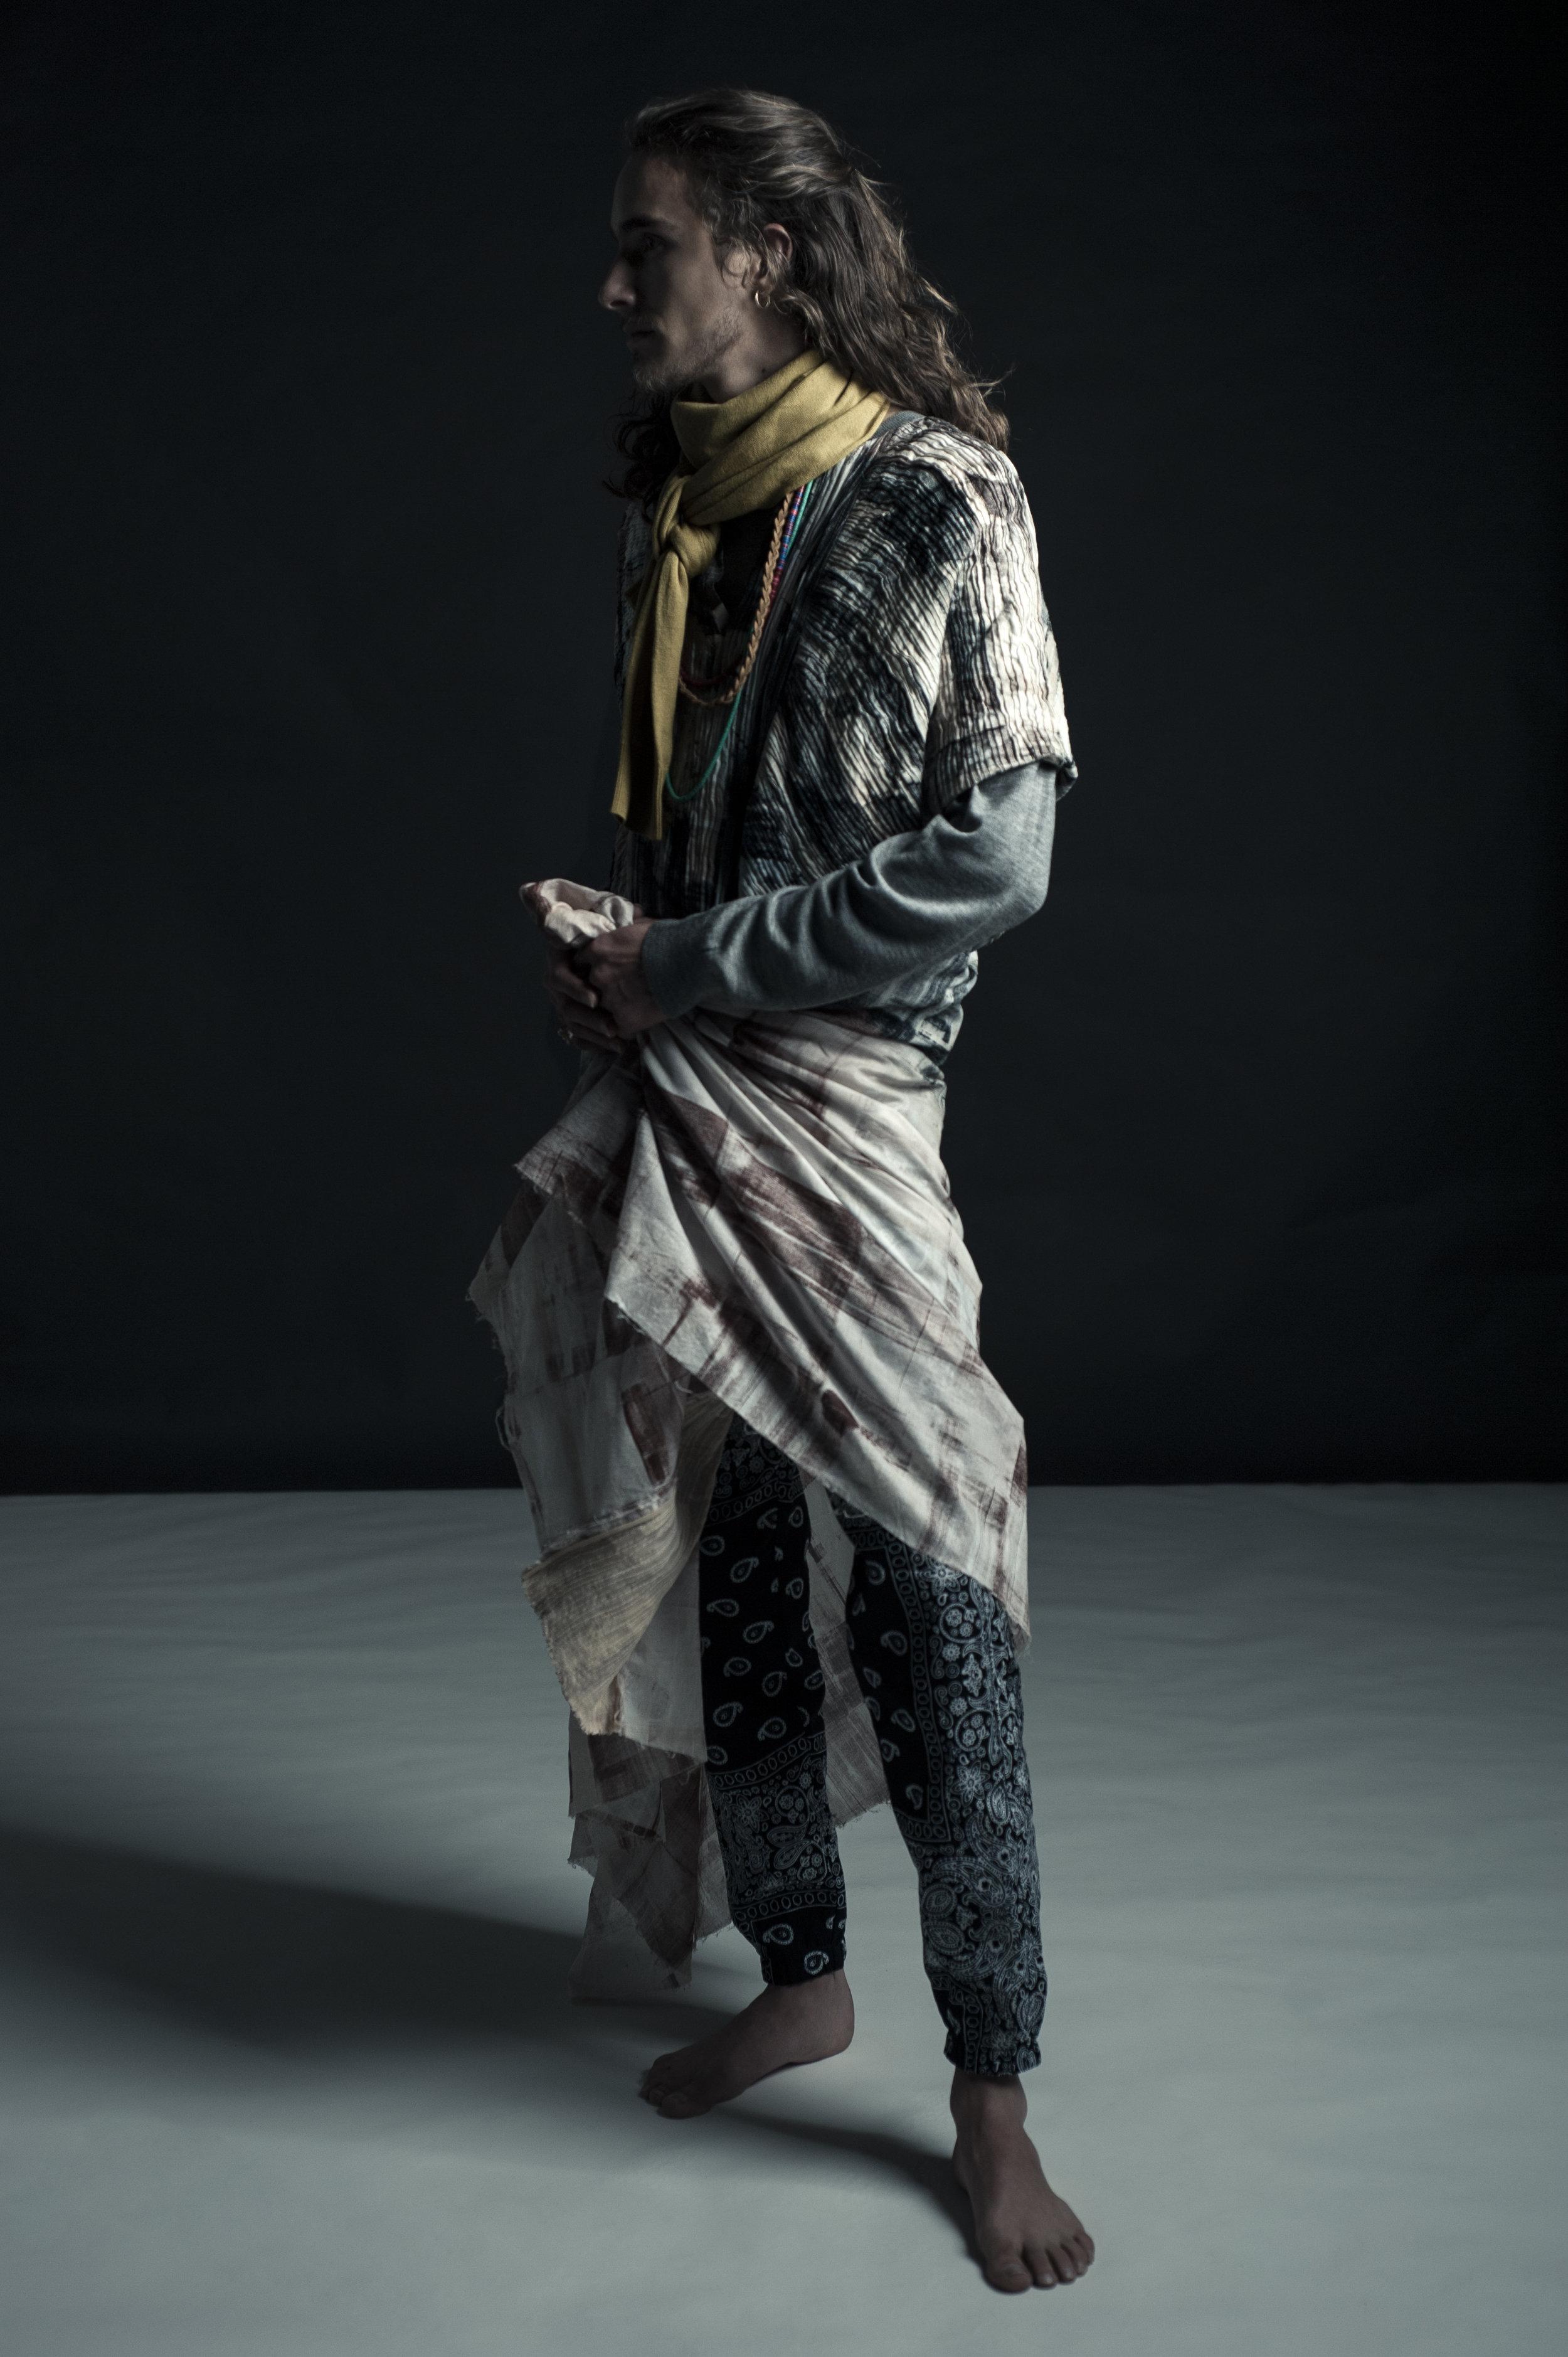 Tunic by Gwen Shihyao Lai, MFA Fashion Design. Bandana Pants by Rik Villa. Necklace, model's own. Sweater (worn as scarf) by UNIQLO.